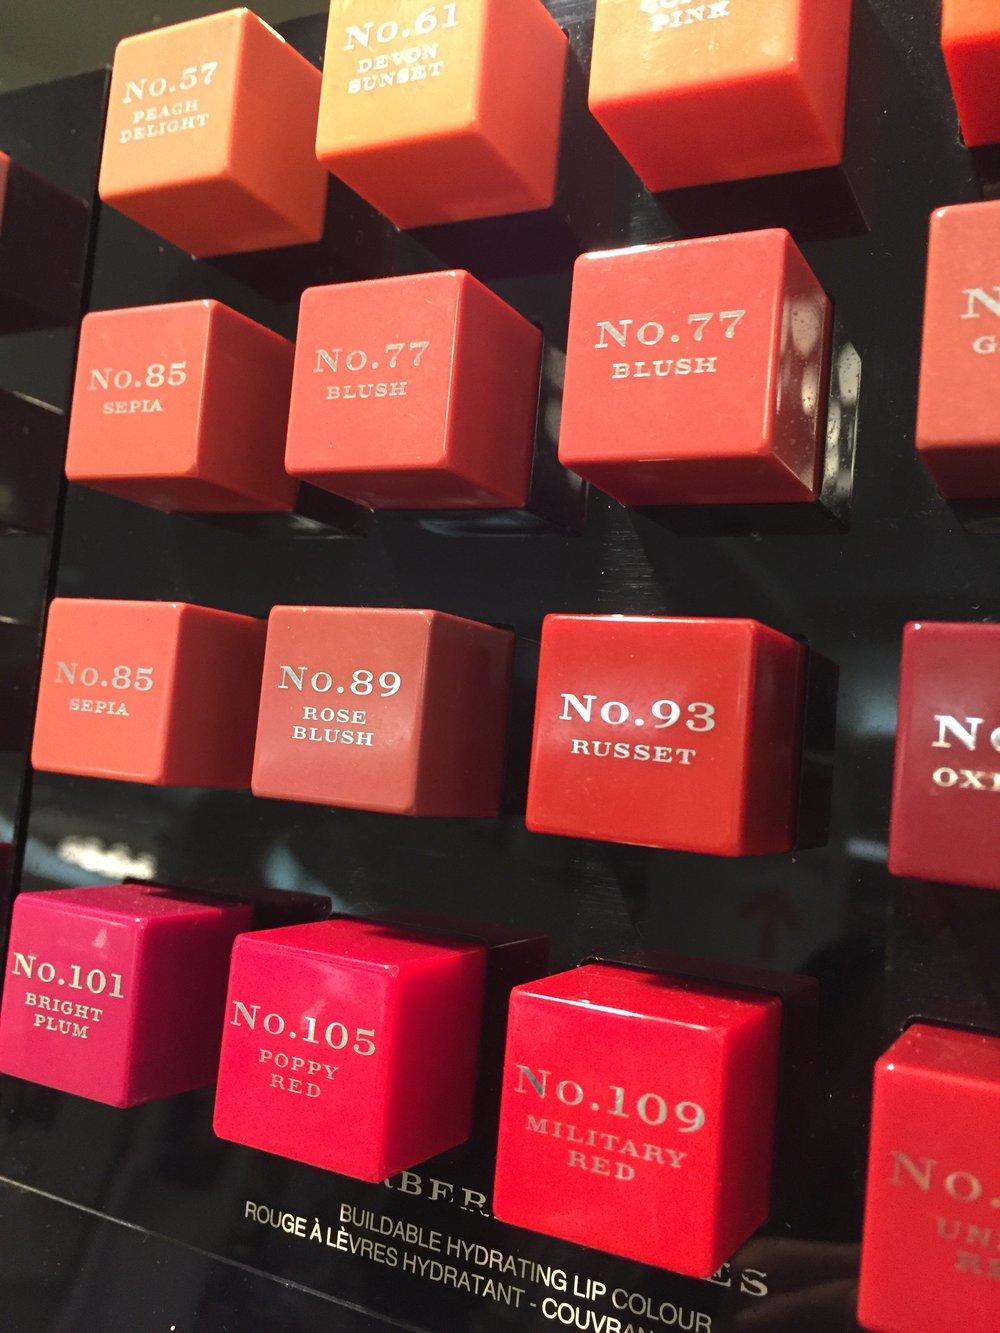 burberry-lipstick-colors